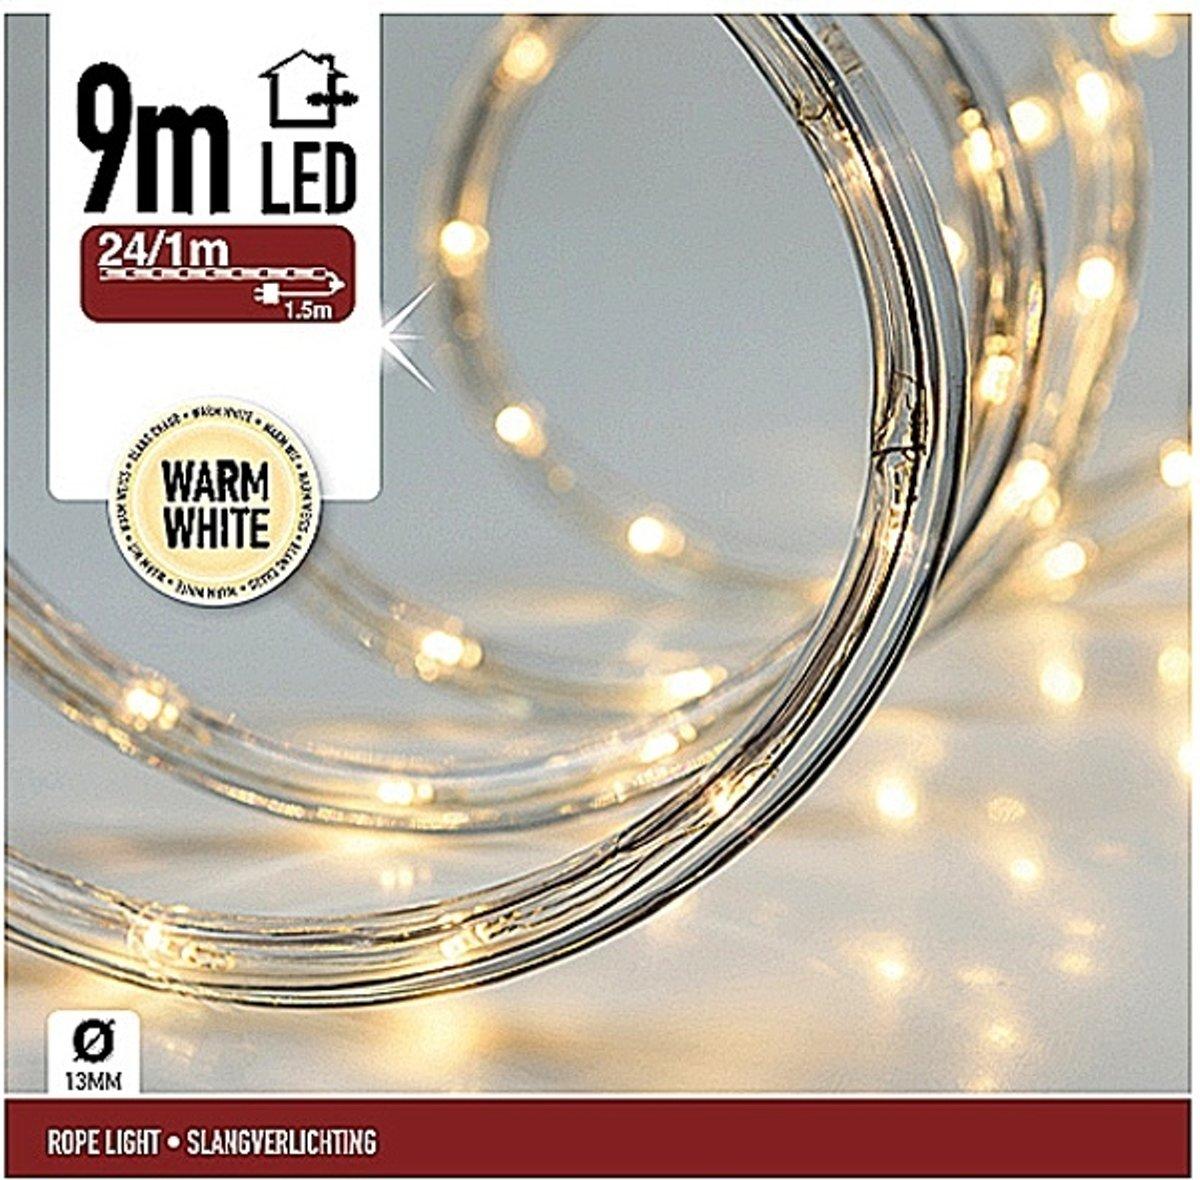 bol.com | Lichtslang kopen? Alle Lichtslangen online